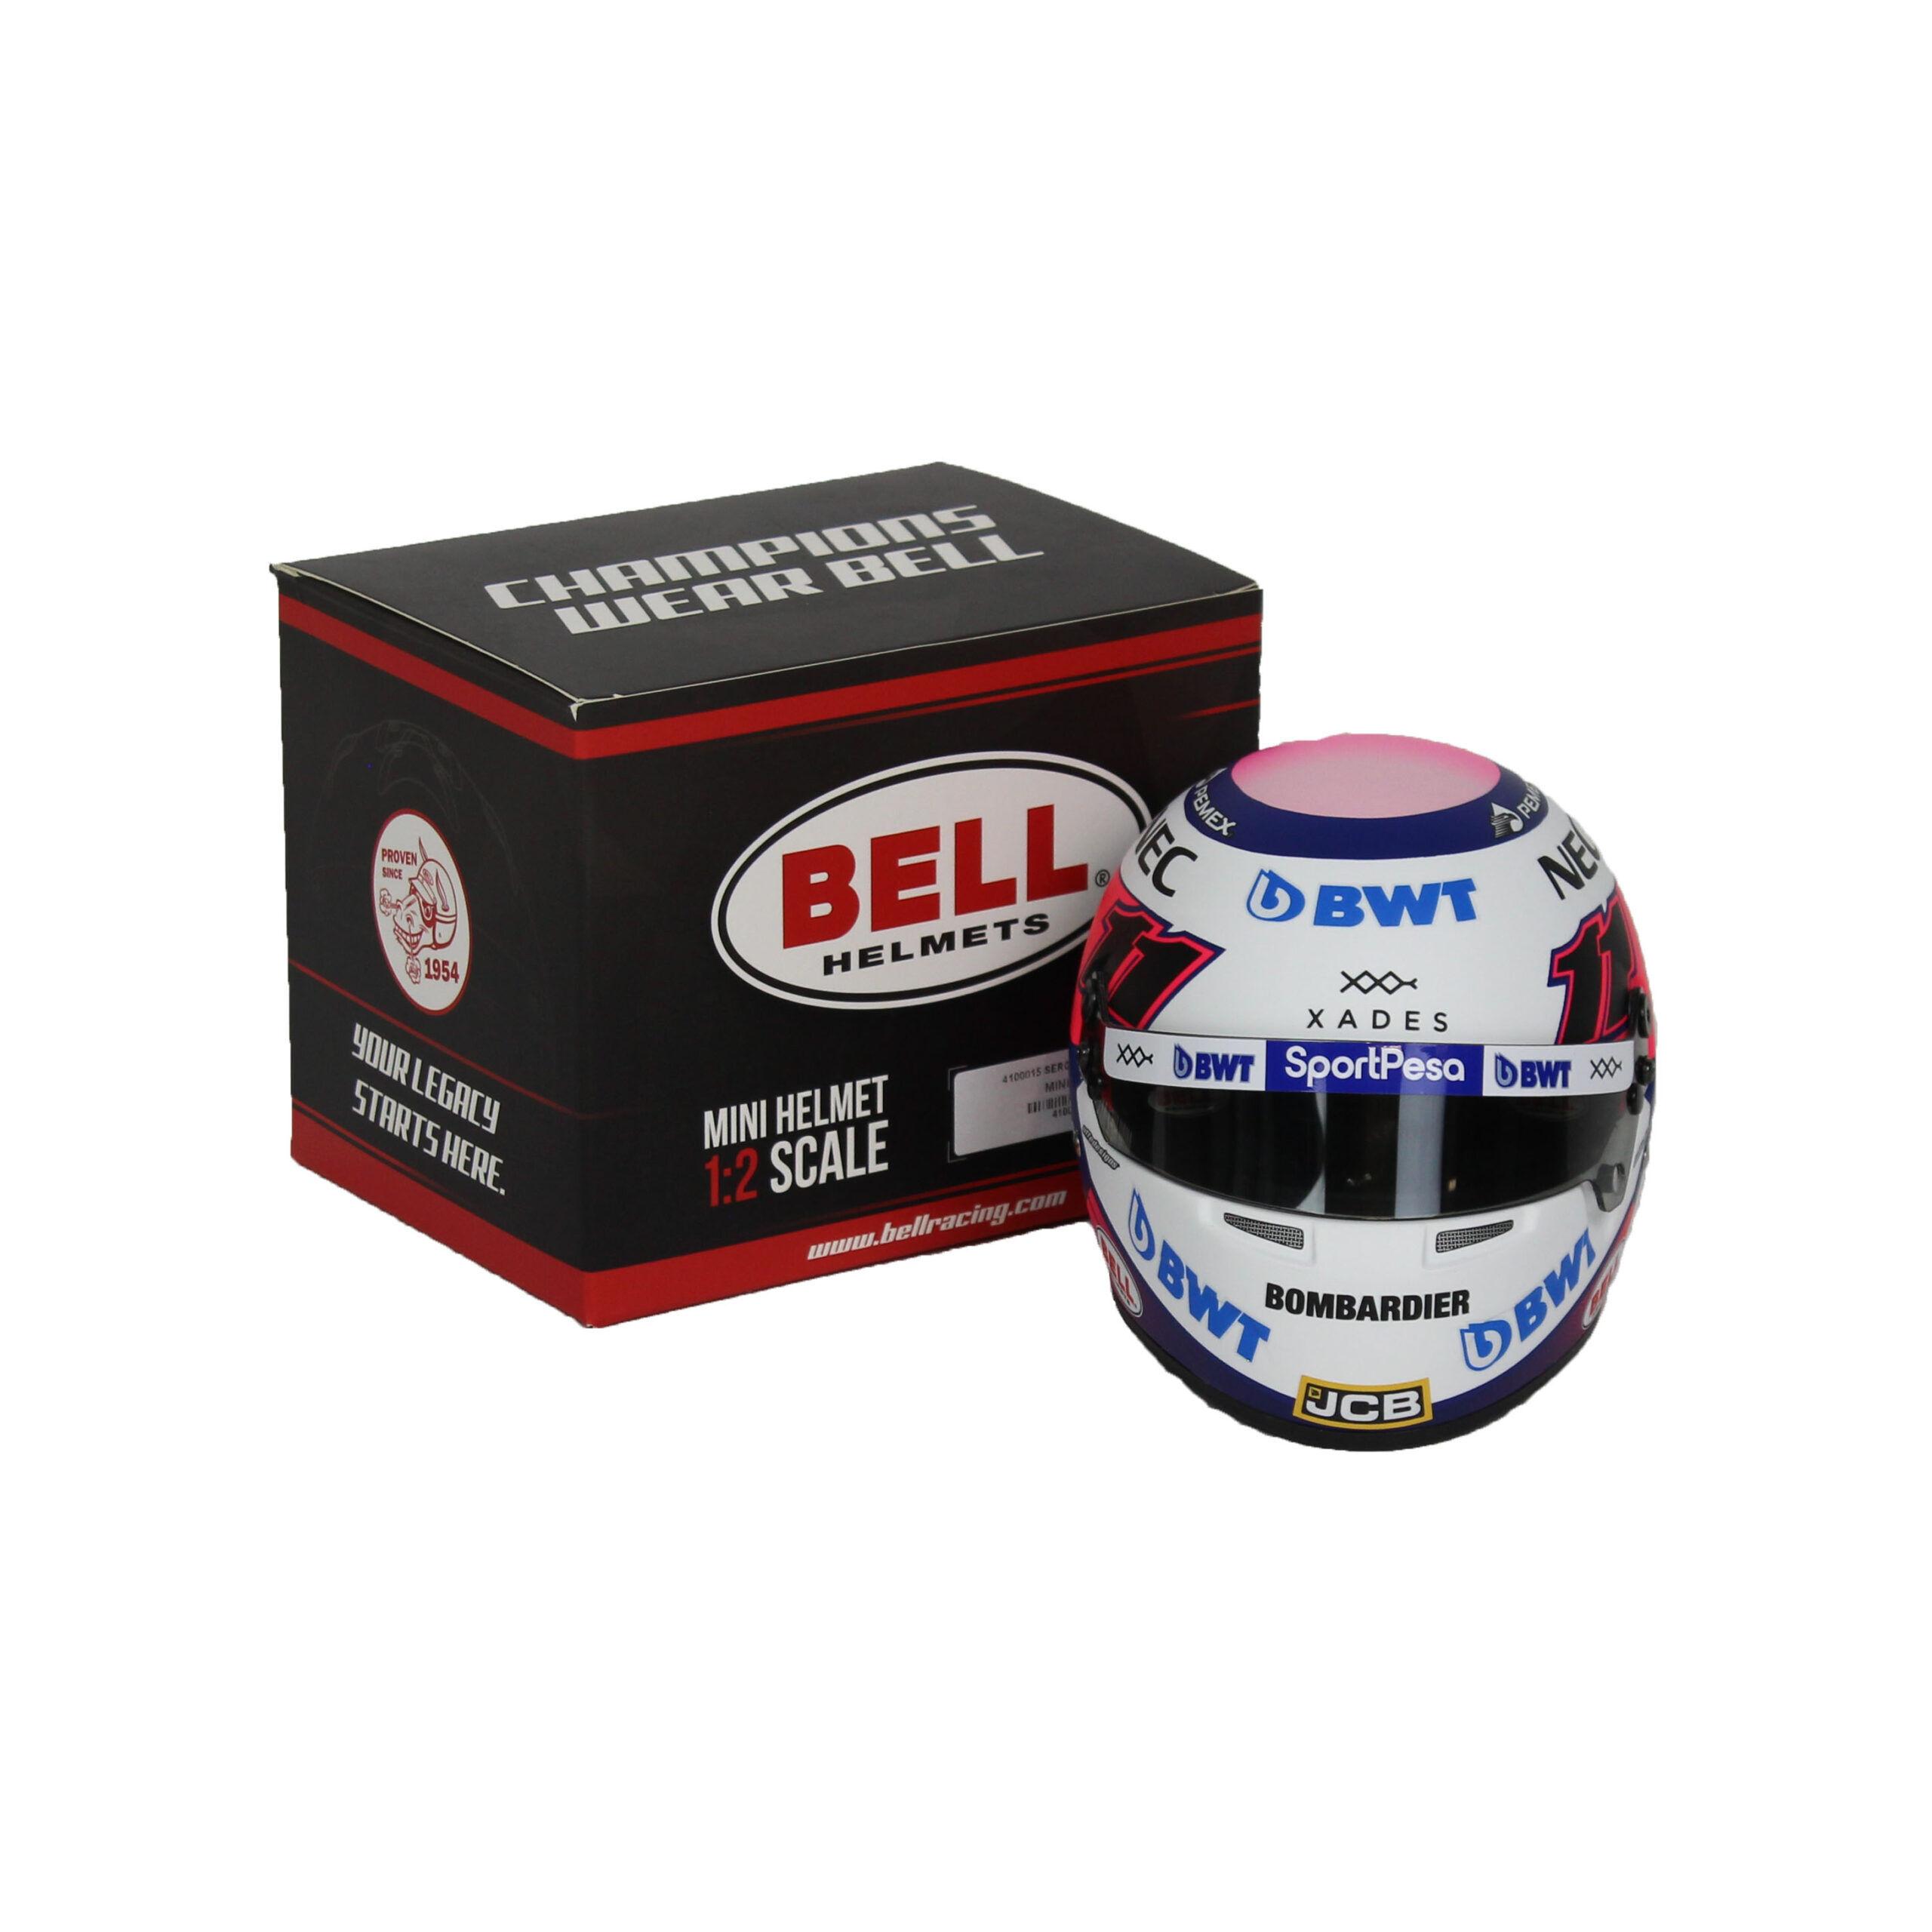 Mini Helm 1/2 Sergio Perez1